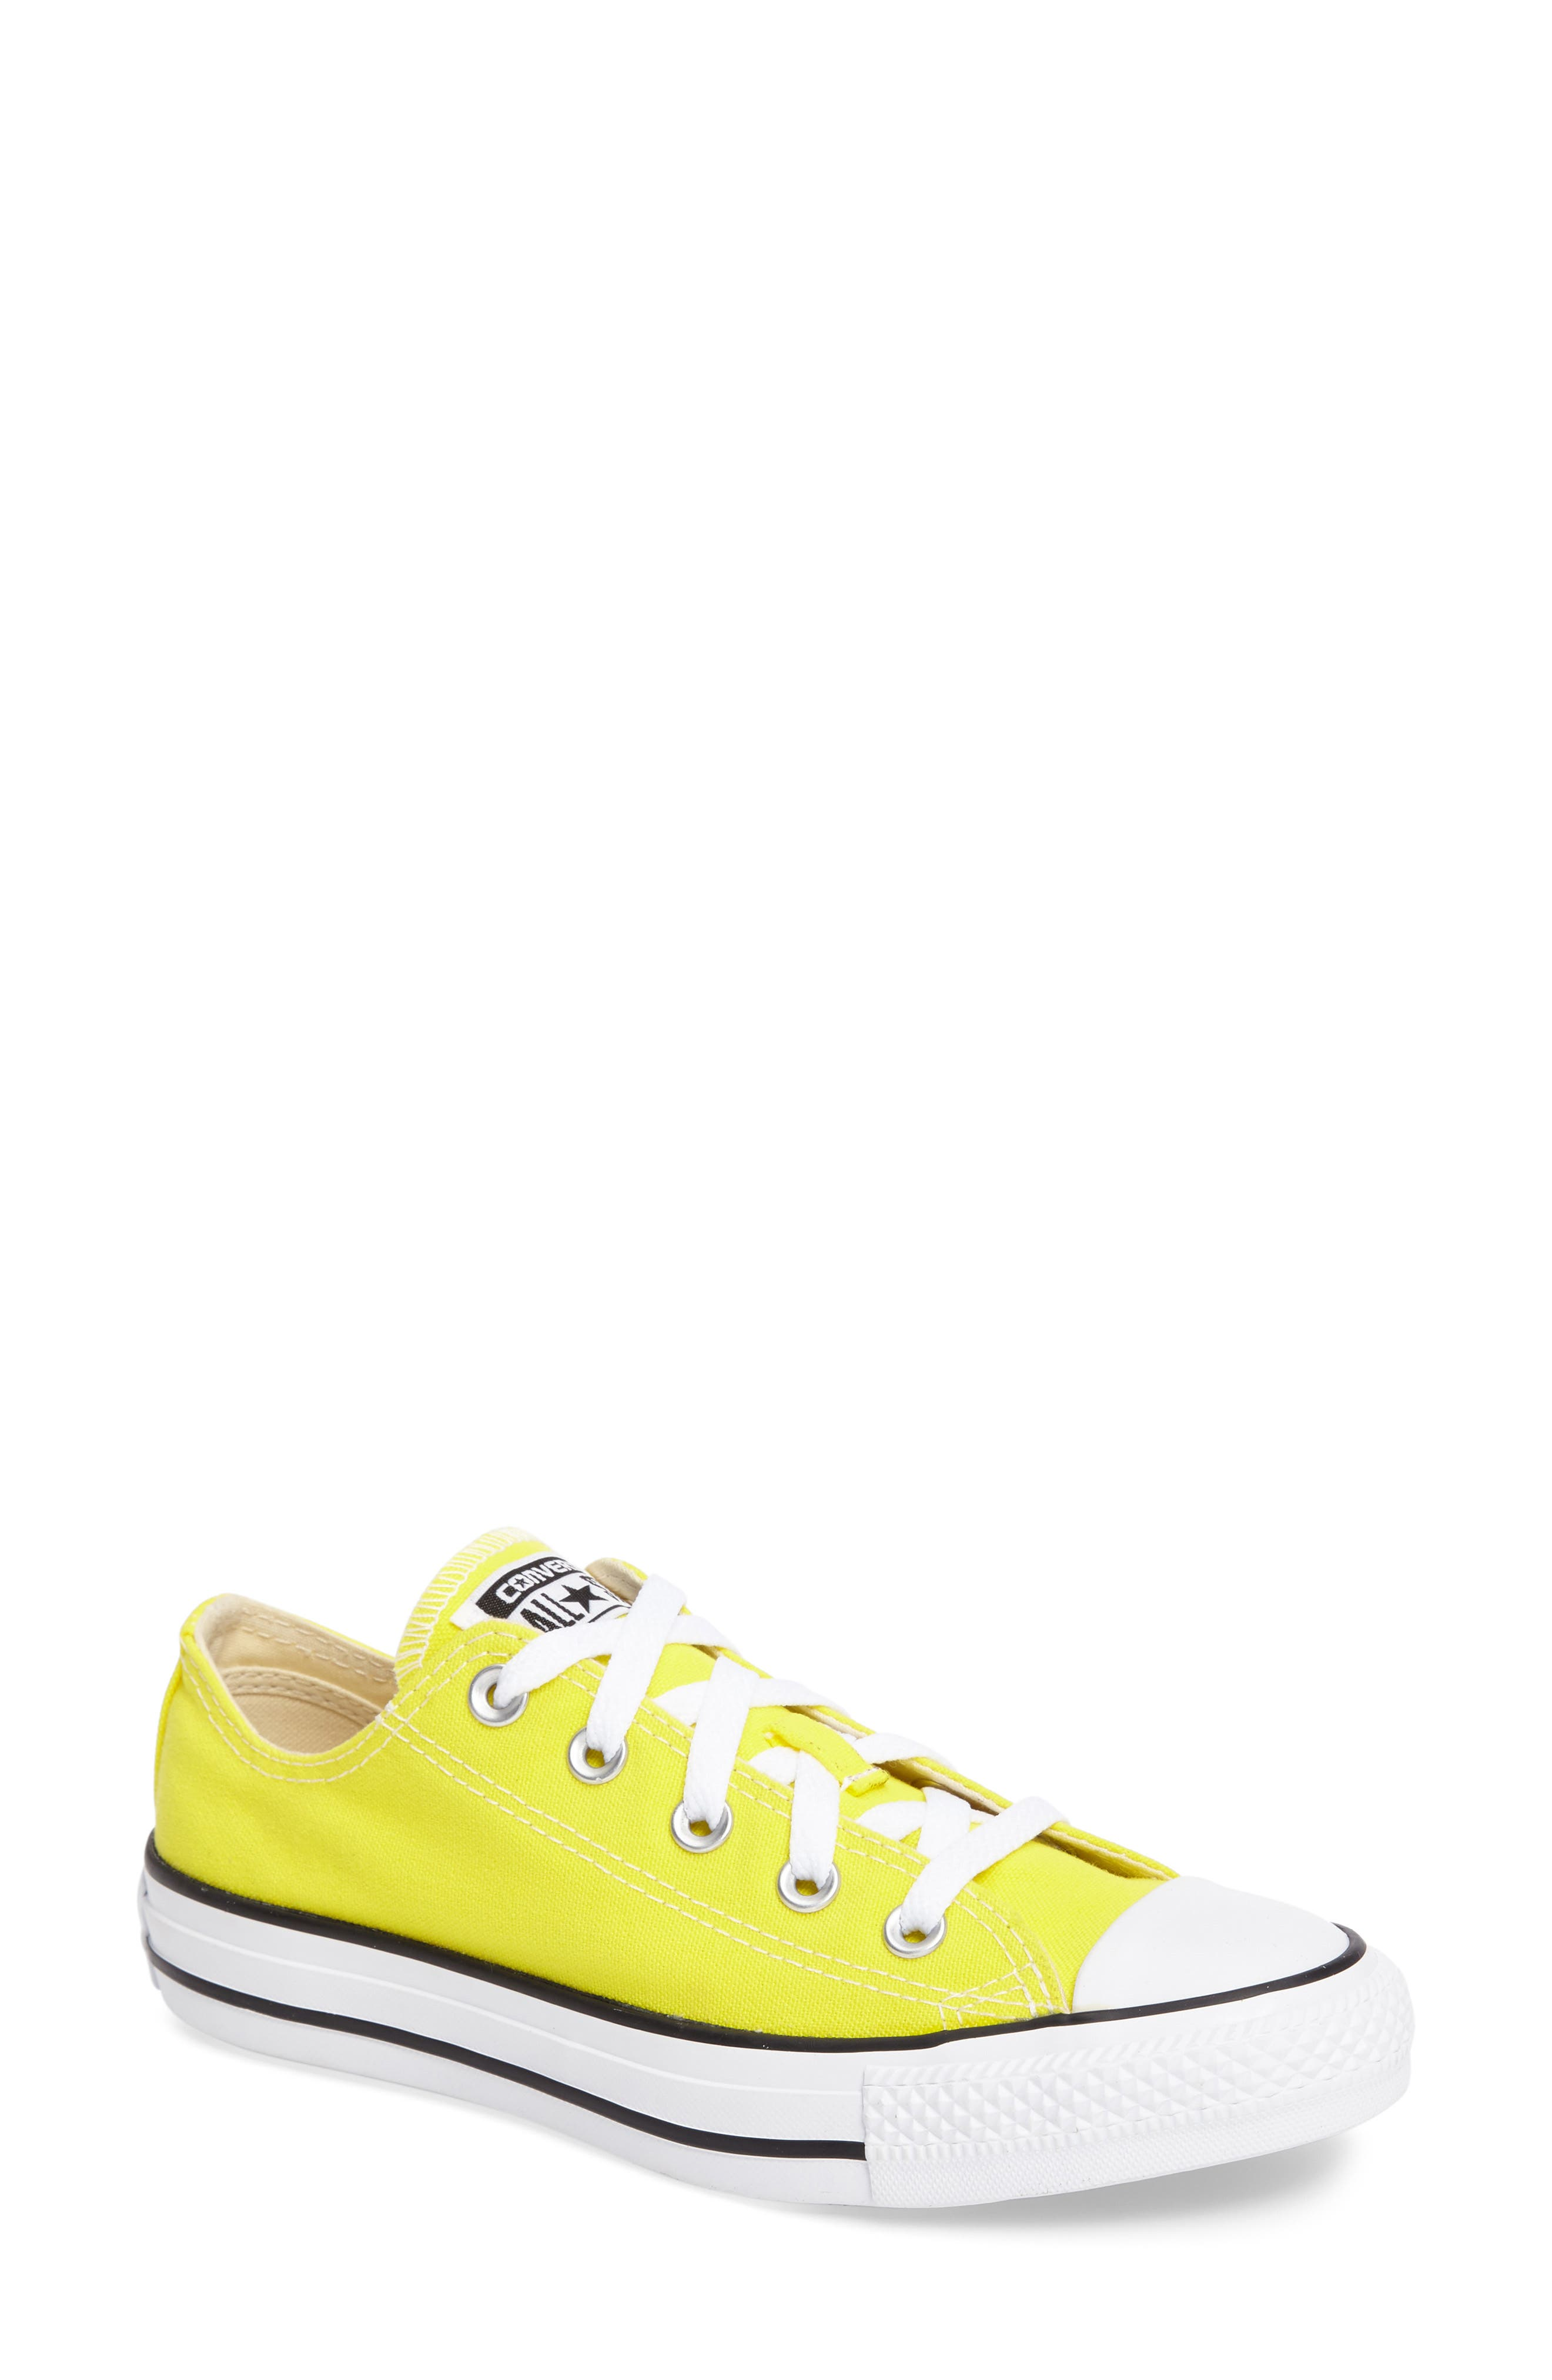 Alternate Image 1 Selected - Converse Chuck Taylor® All Star® Seasonal Ox Low Top Sneaker (Women)